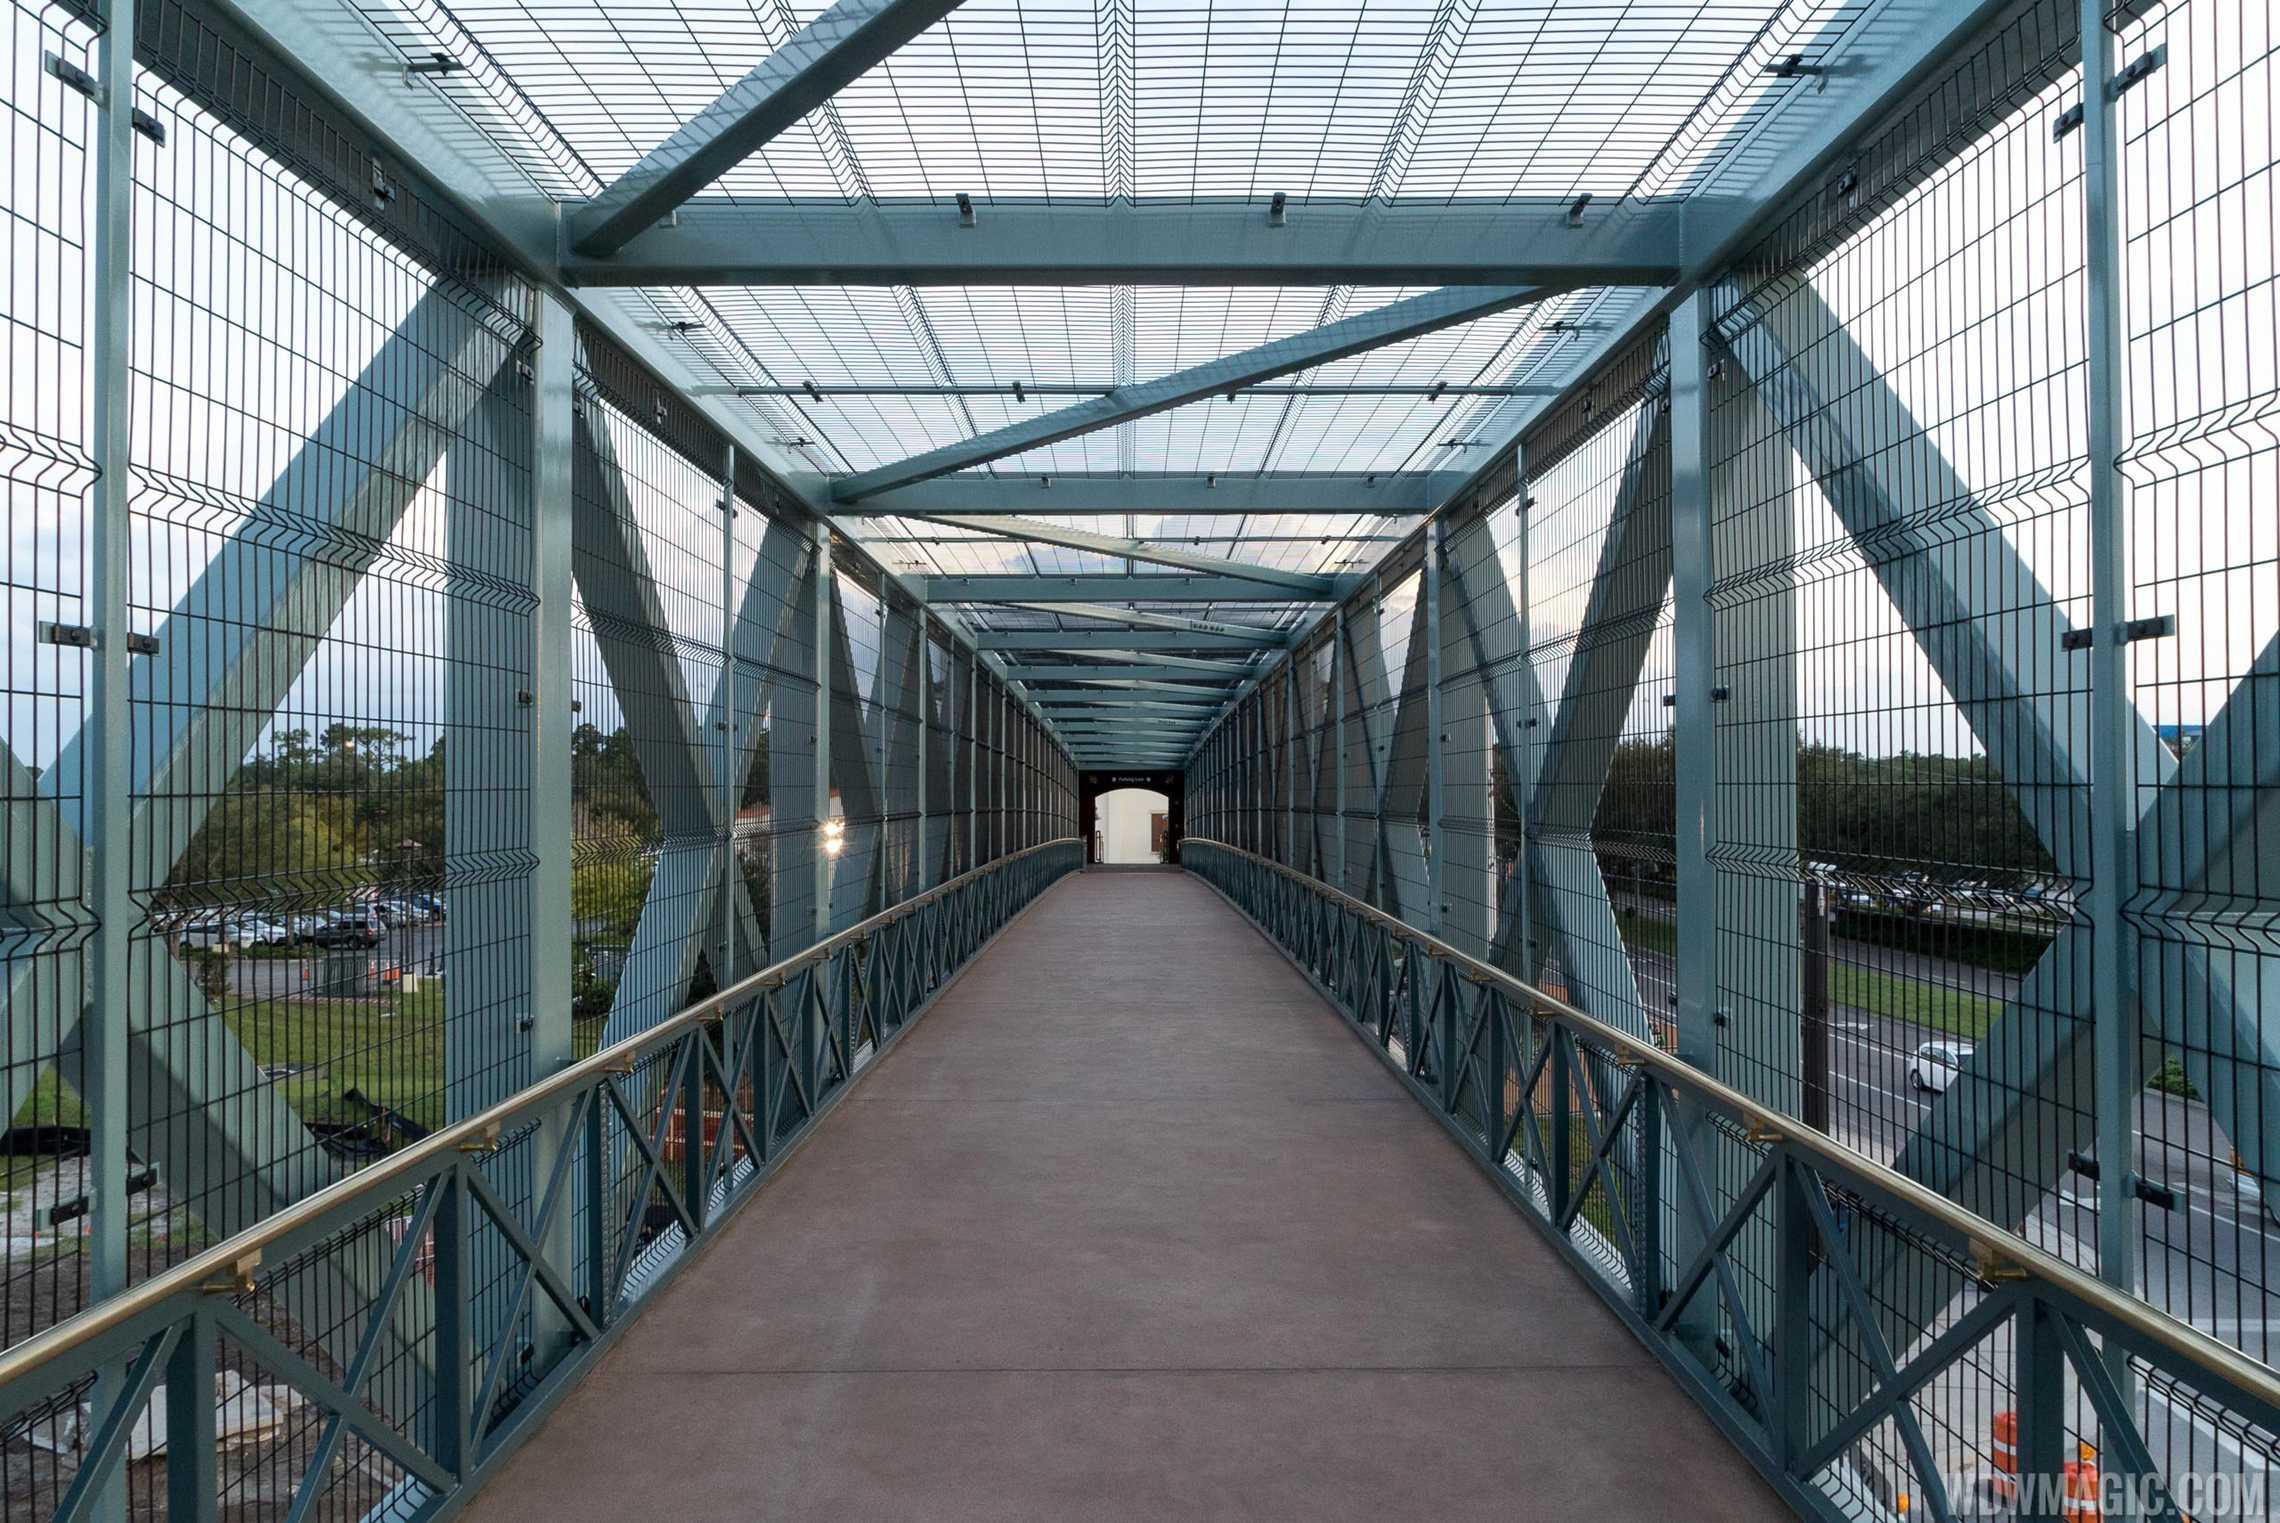 Looking across the bridge towards Team Disney